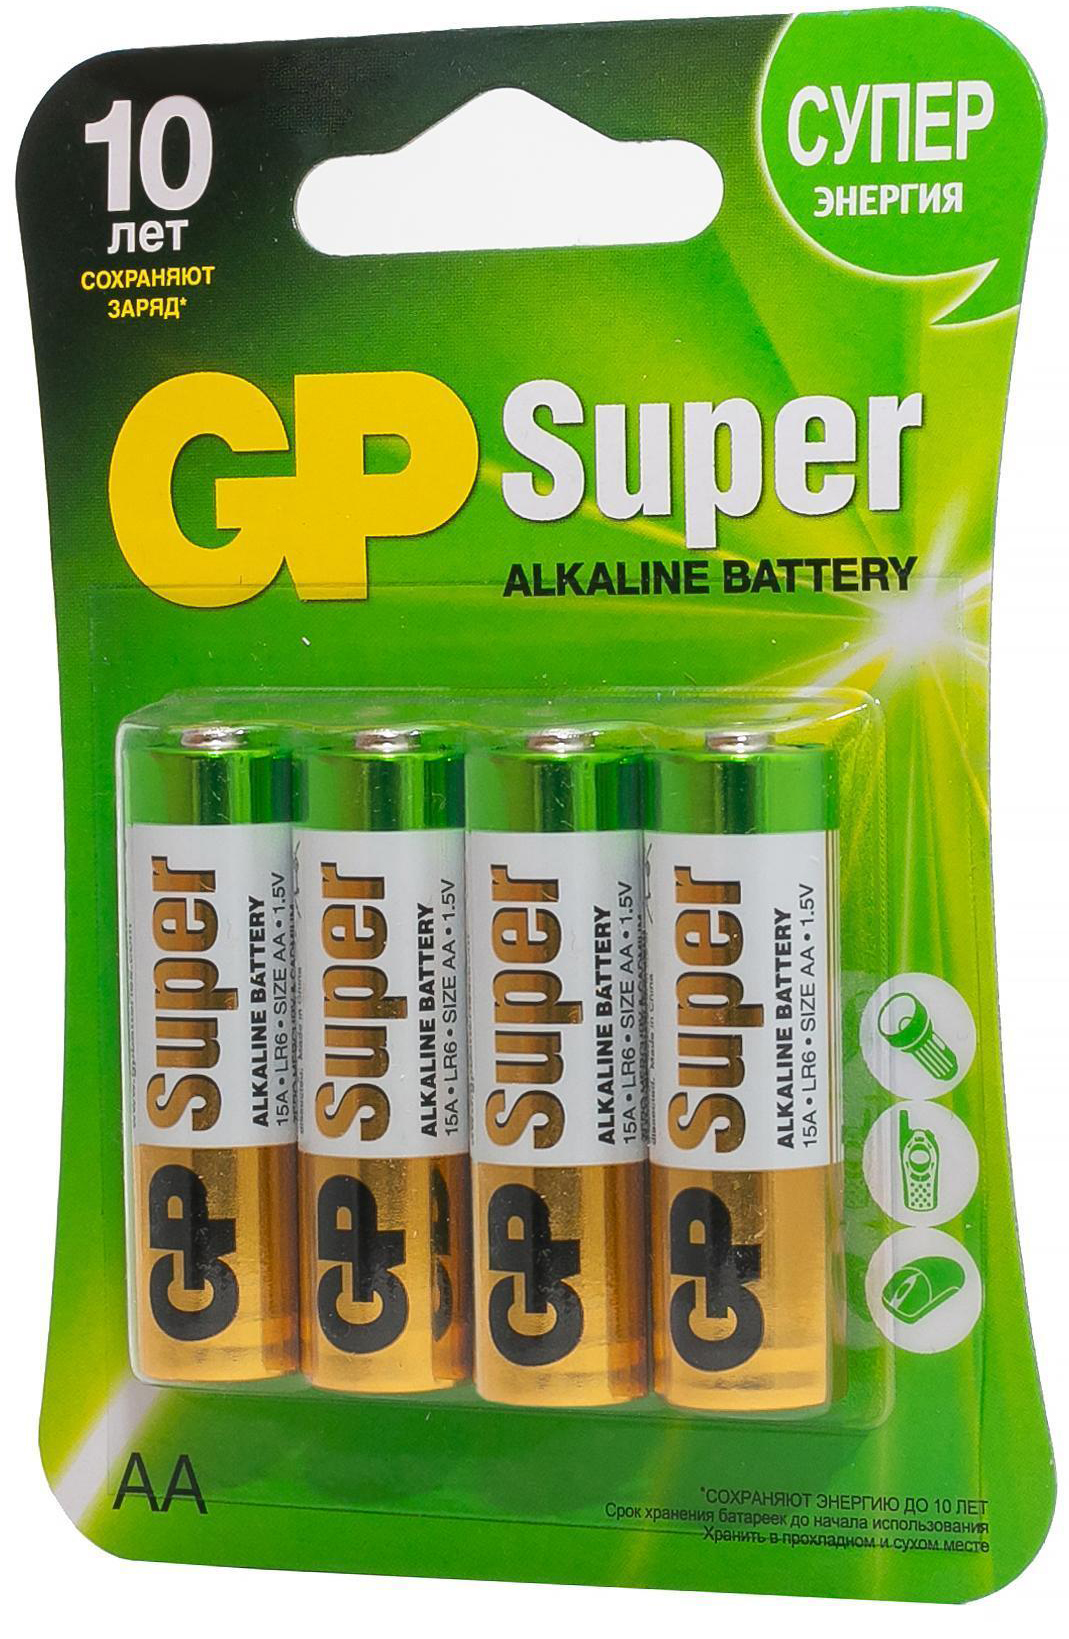 Фото - Алкалиновые батарейки GP Super Alkaline 15А АA (Блистер, 4 шт) алкалиновые батарейки gp ultra alkaline 13а типоразмера d блистер 2 шт